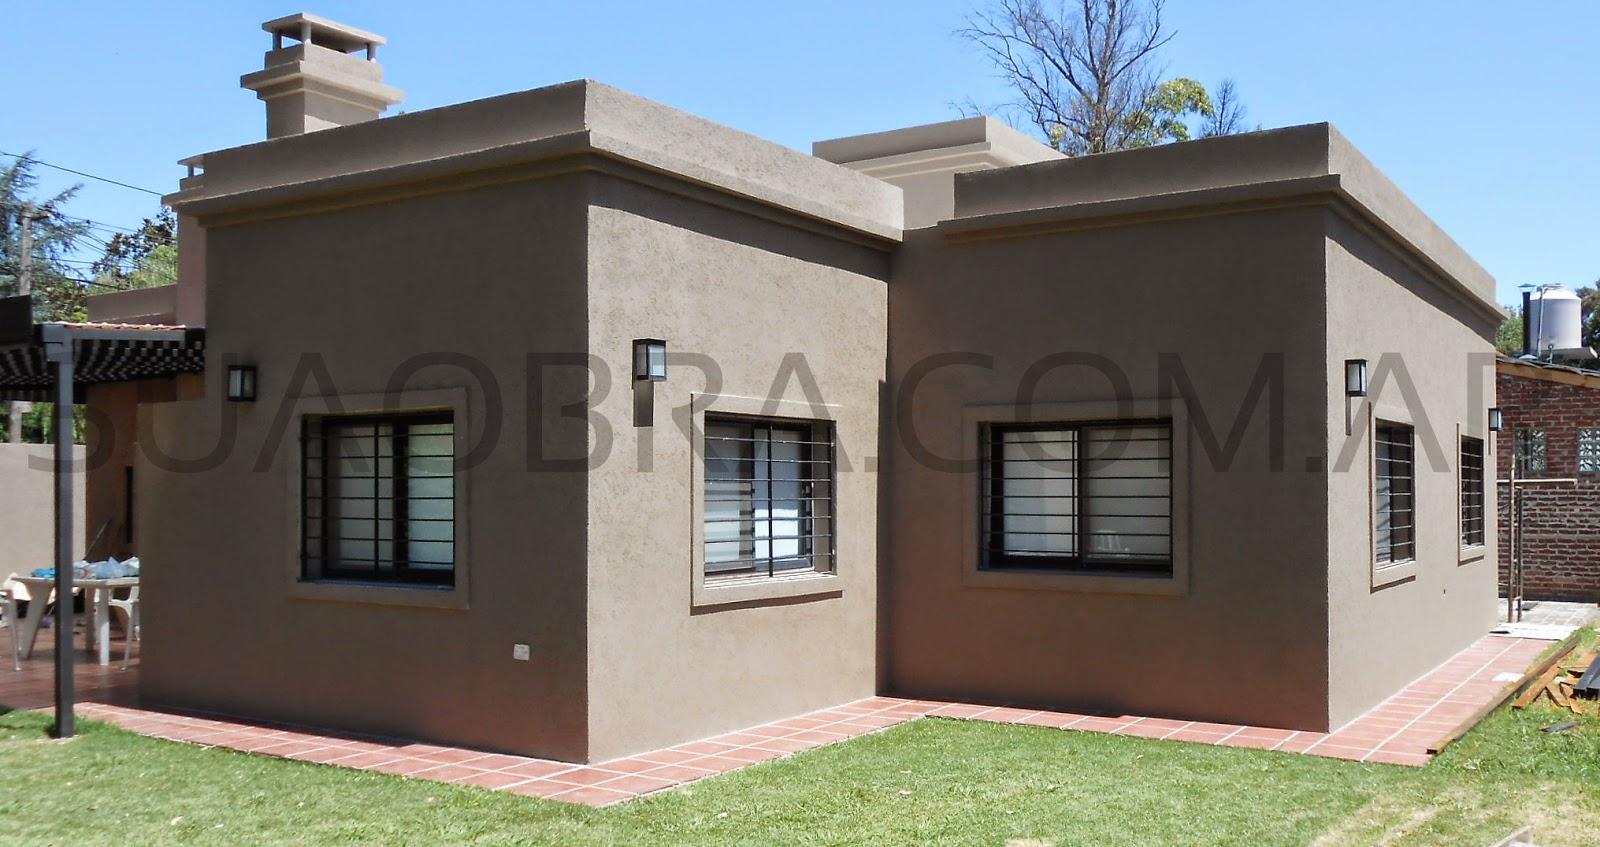 Suaobra revestimientos tel 4589 7878 cel 15 3553 5720 for Revestimientos para exteriores